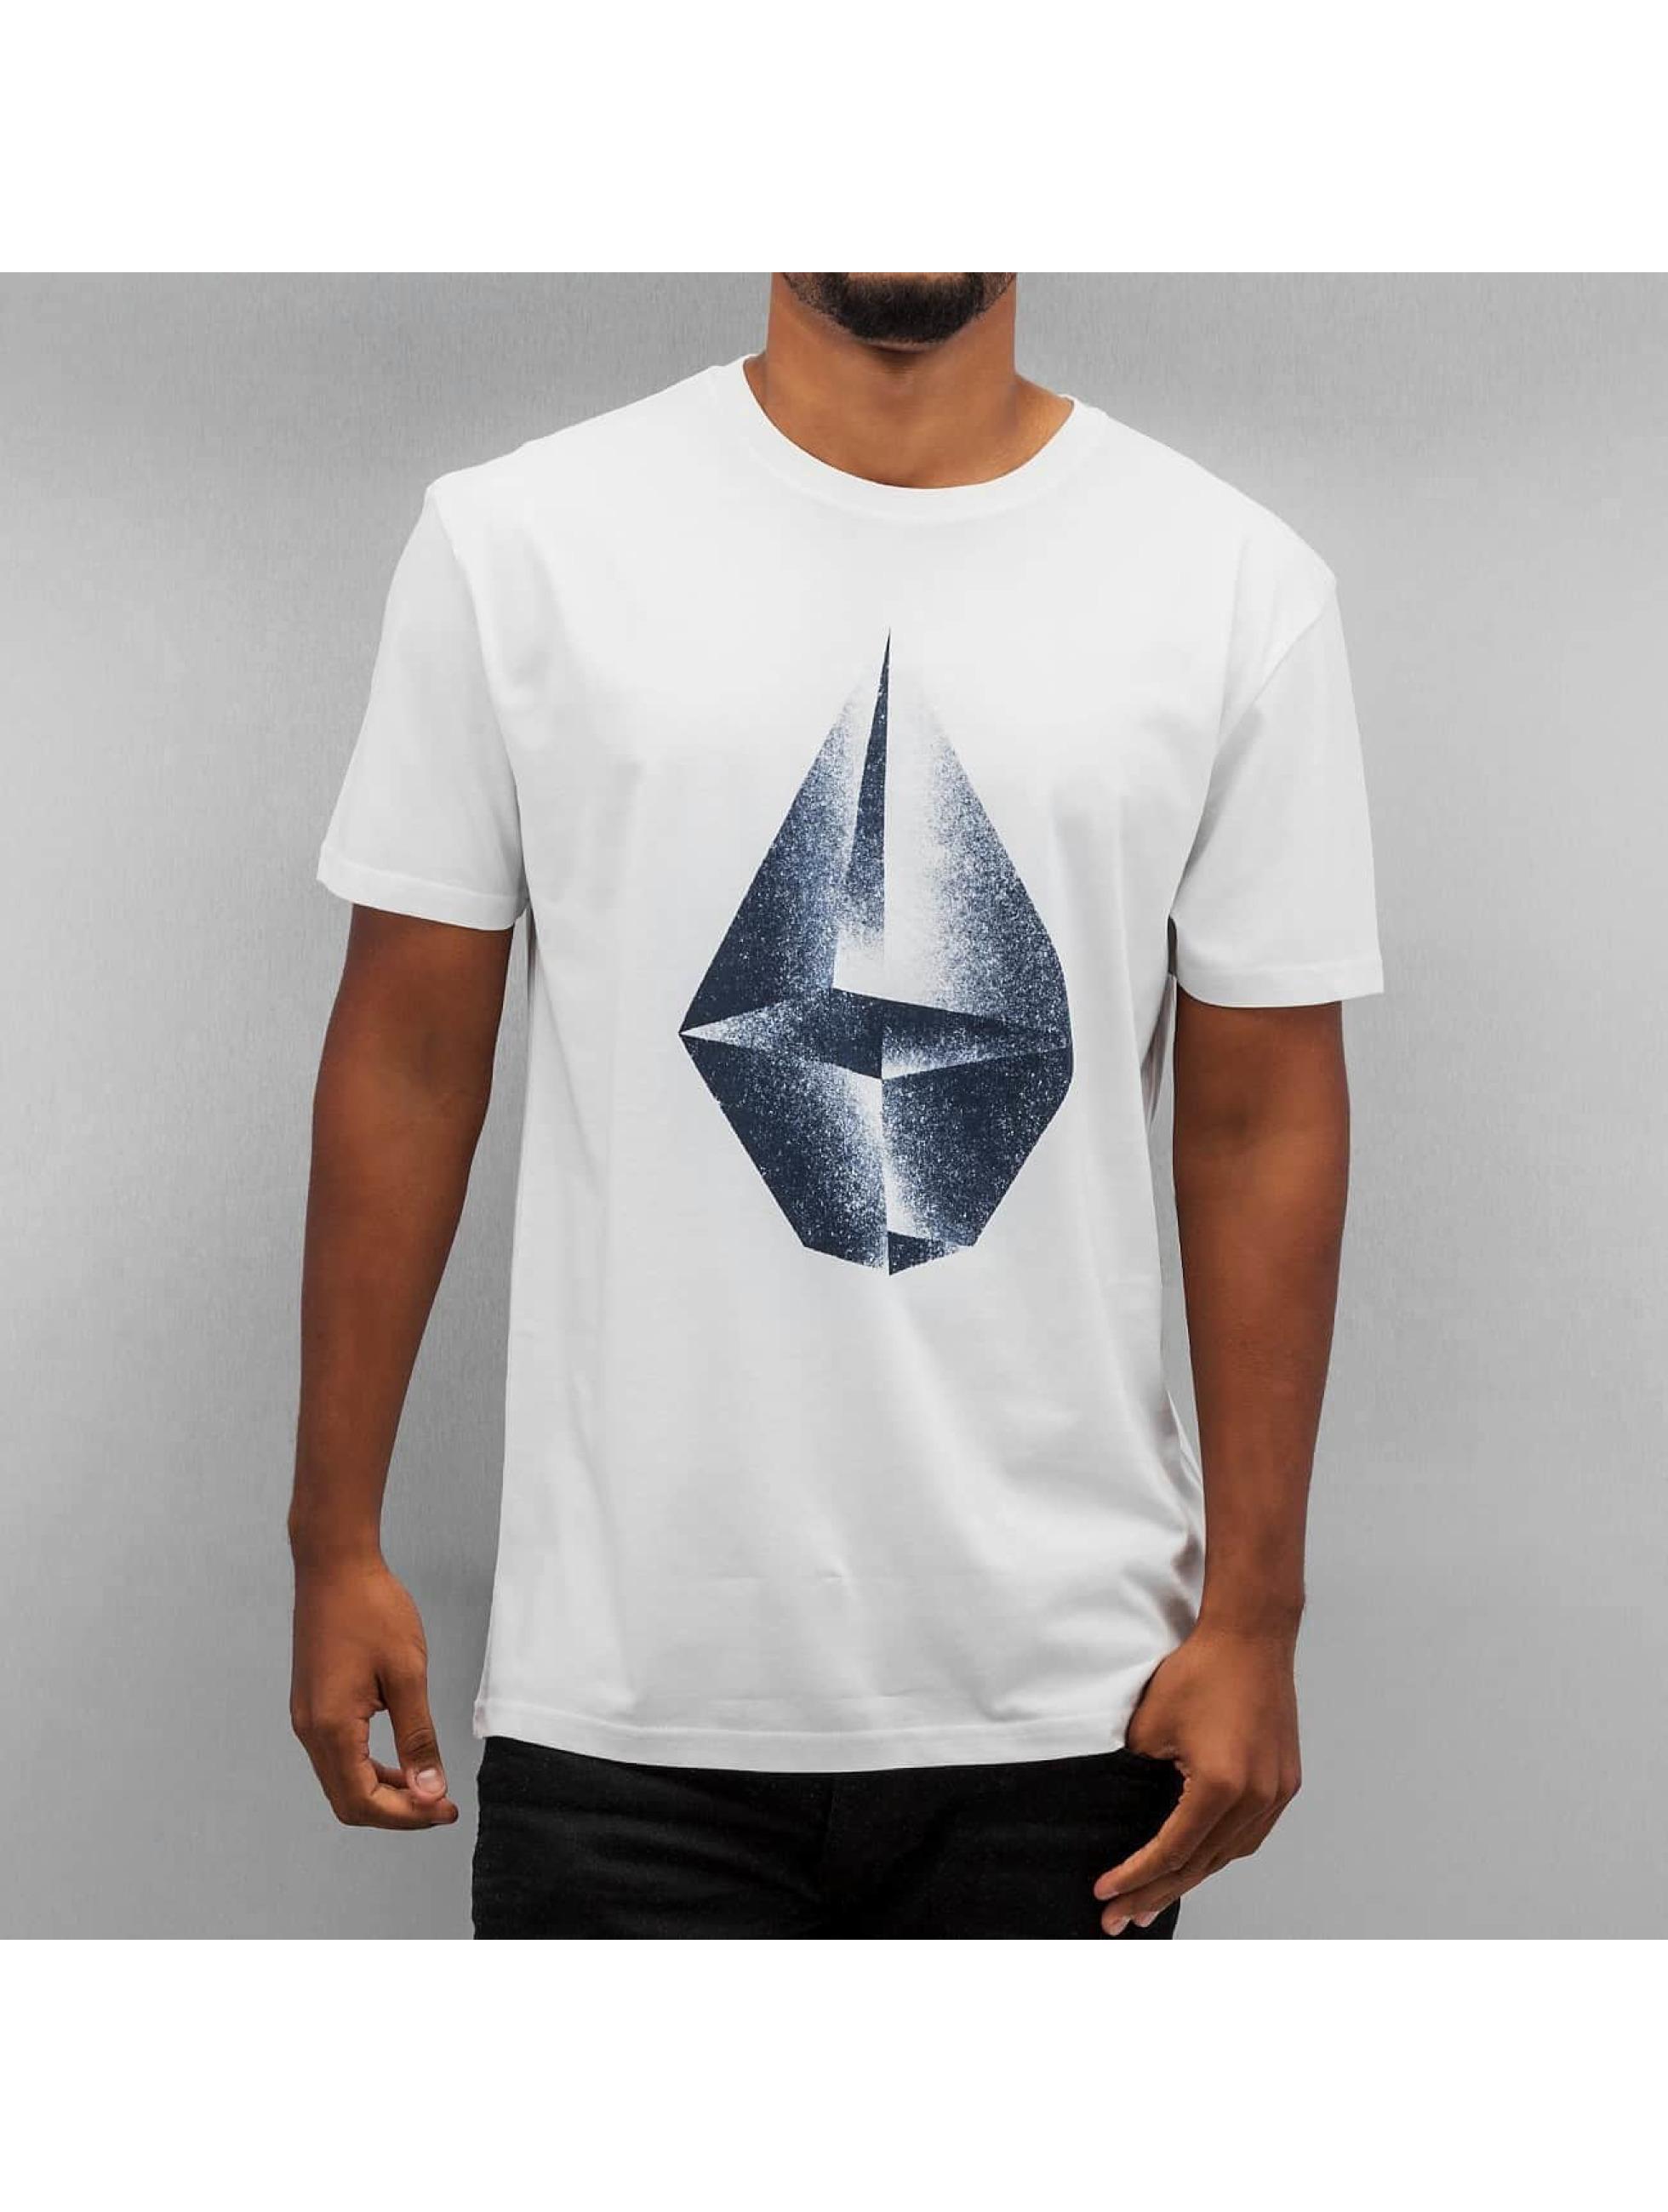 Volcom T-Shirt Shape Shifter white